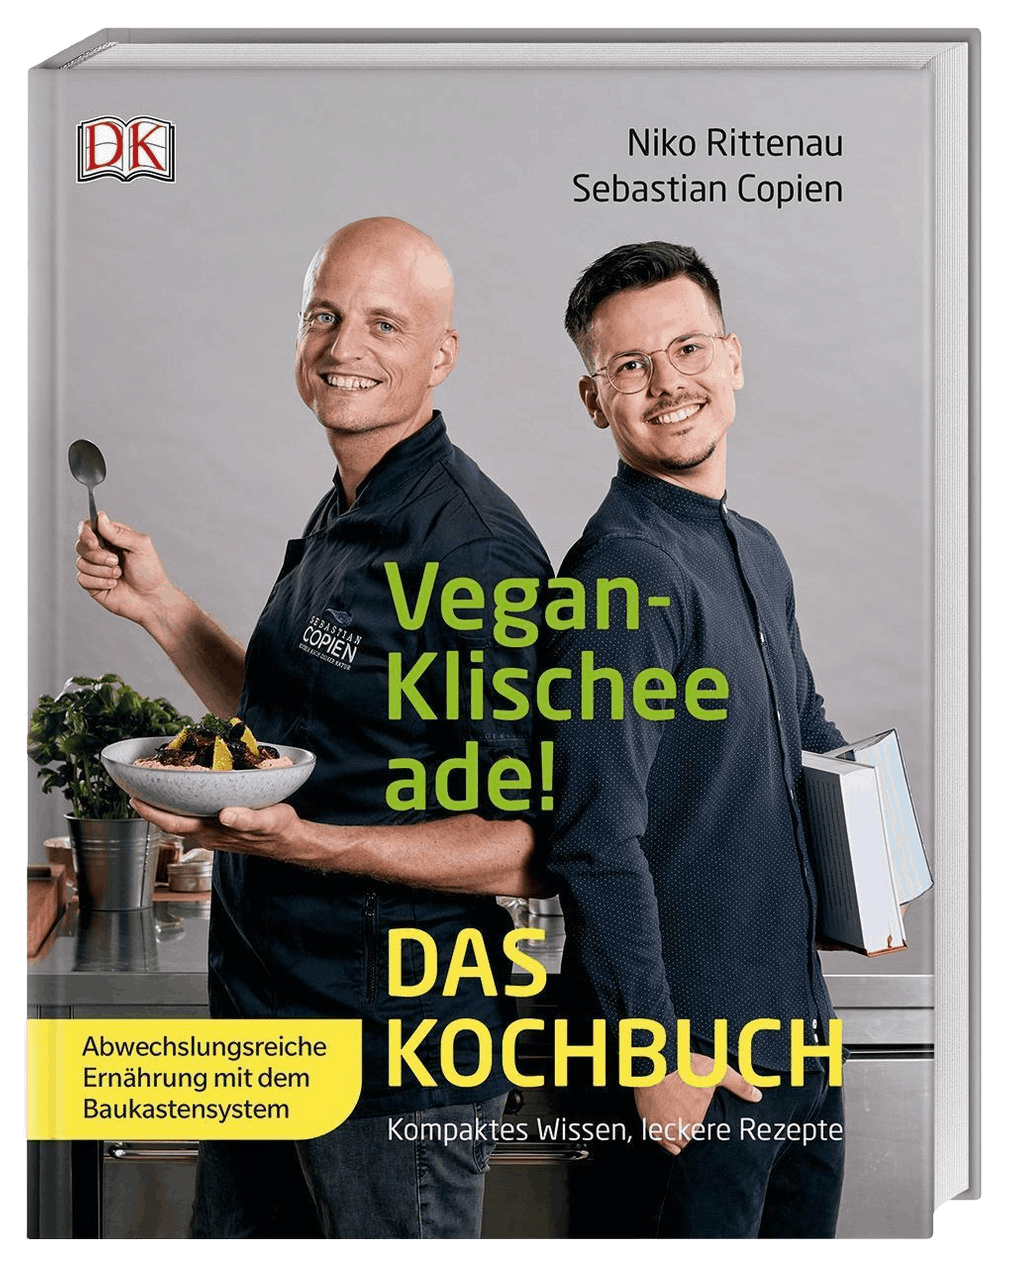 Vegan Klischee Ade Kochbuch